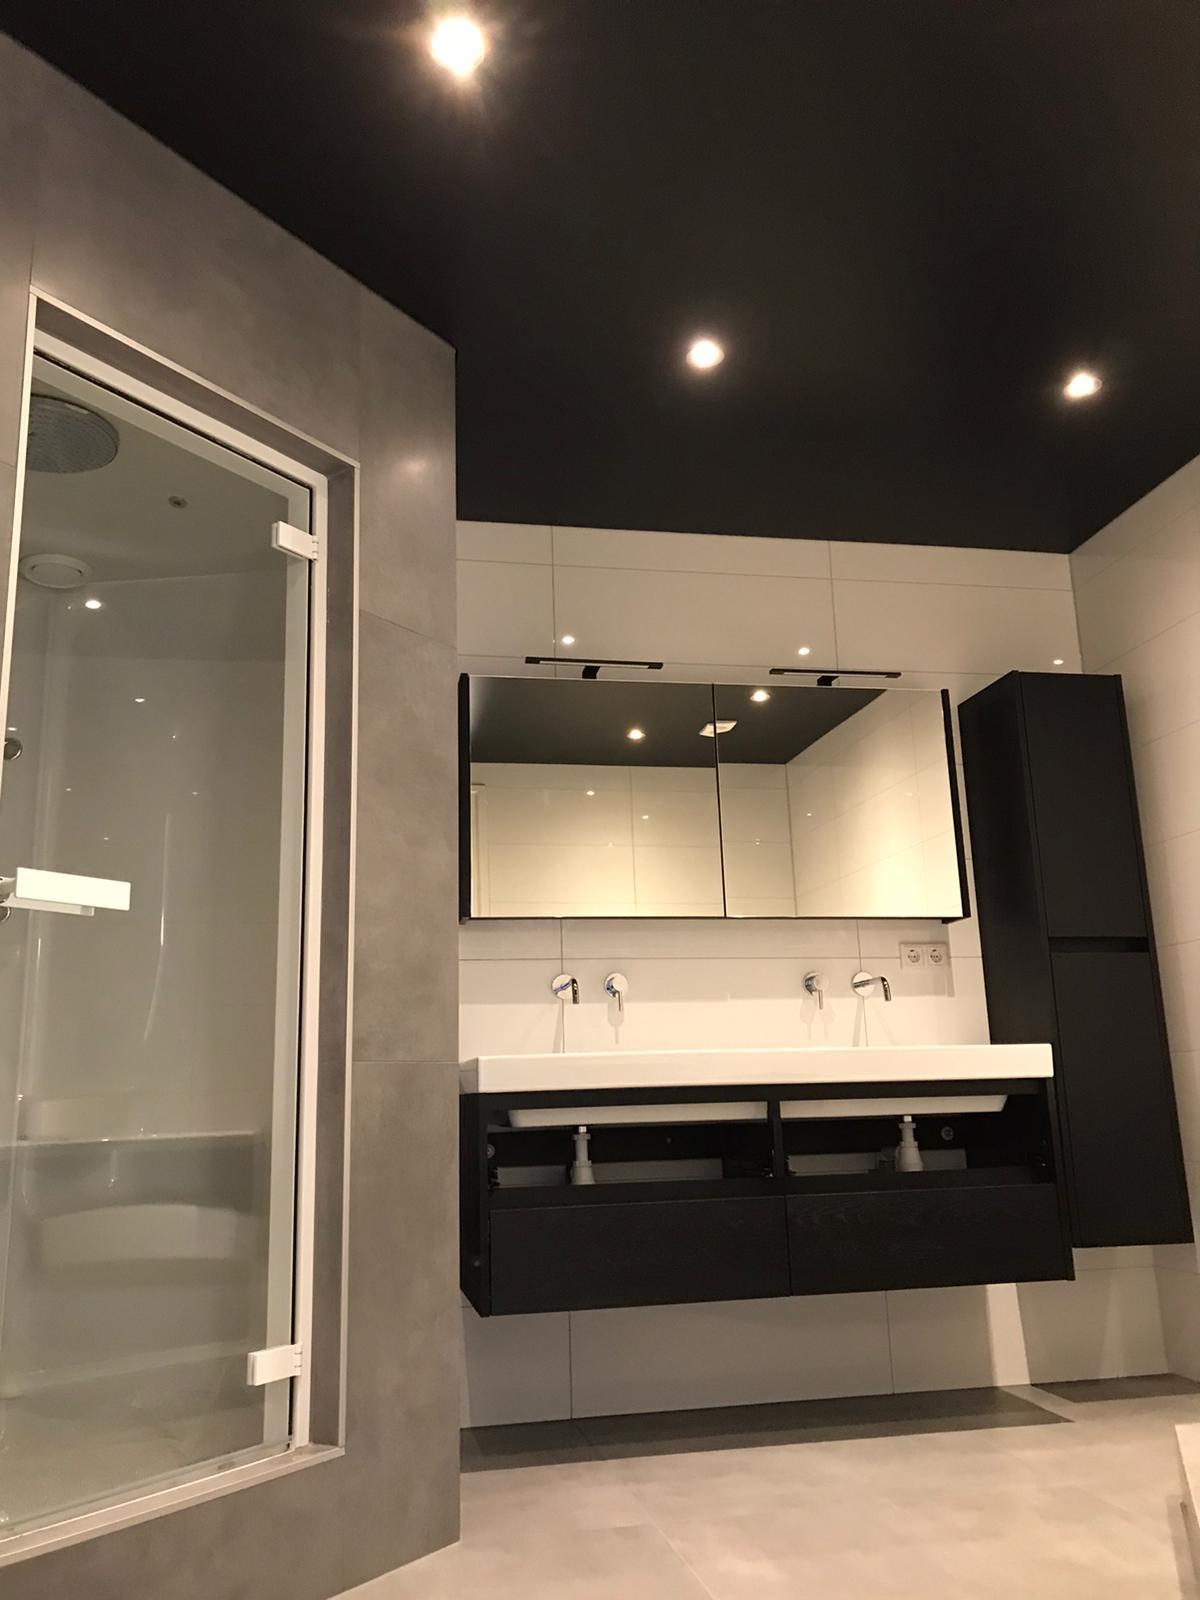 matzwart spanplafond voor badkamers